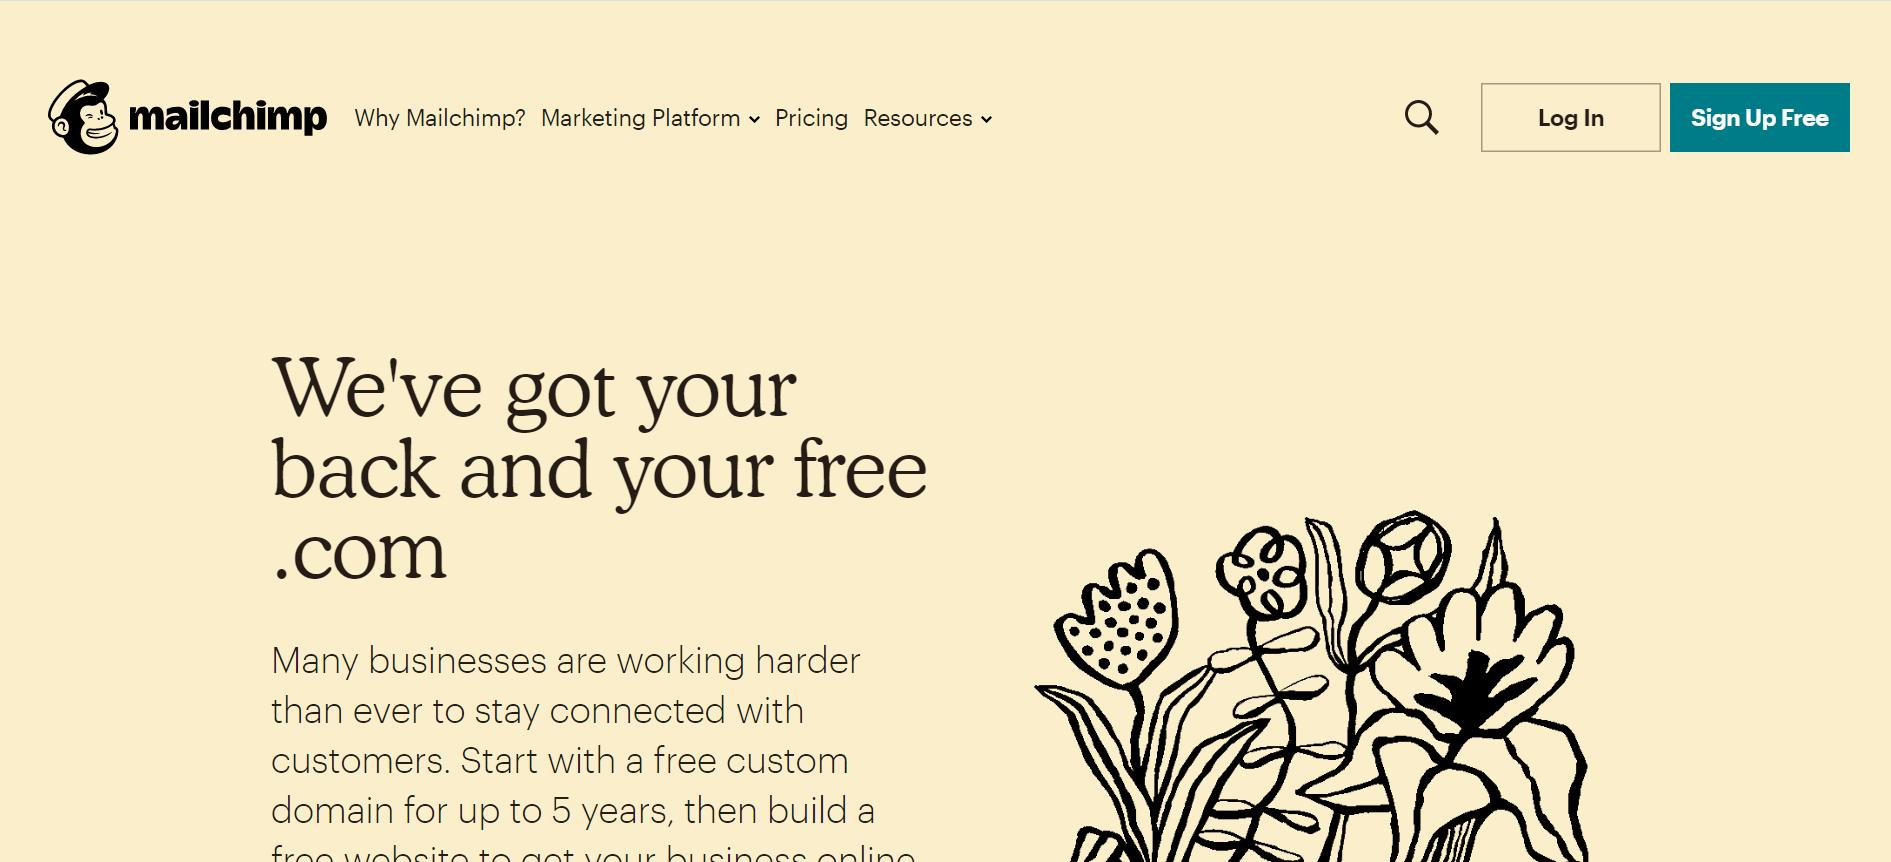 mailchimp-email-marketing-service